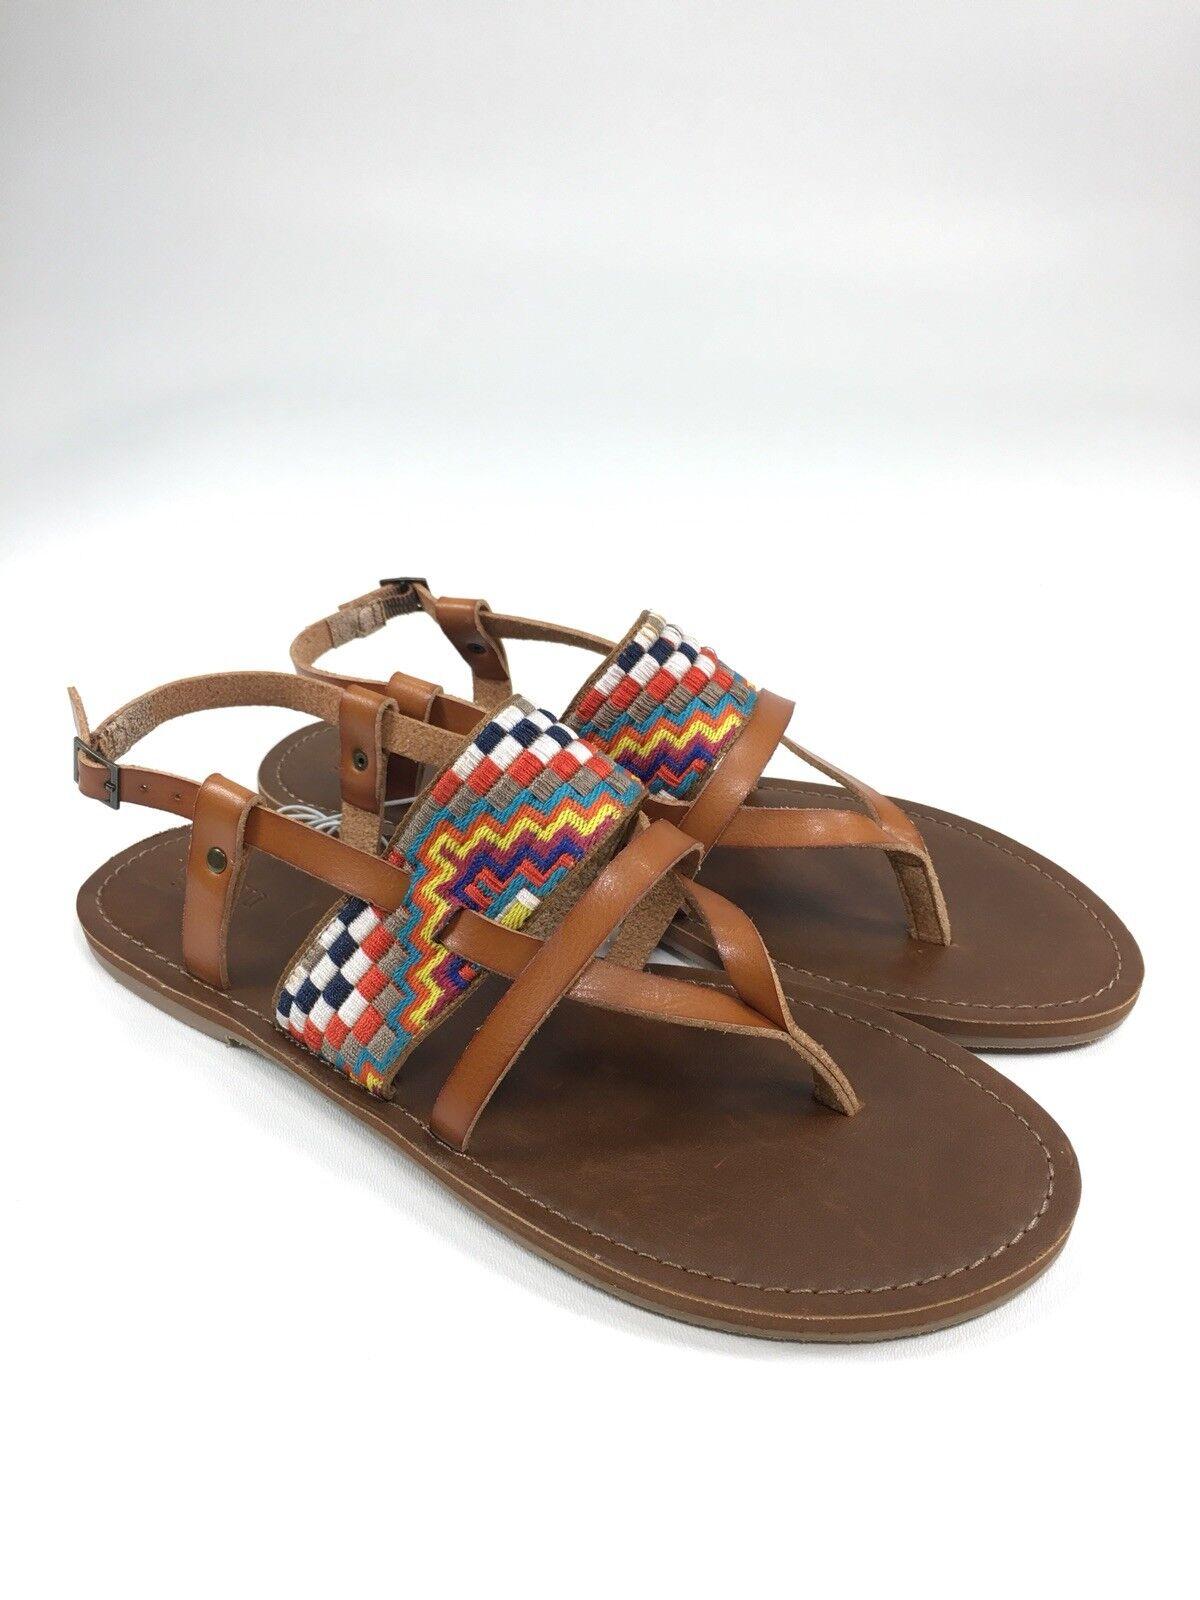 YELLOW BOX ~ Rainbow Black Flip Flops / Sandals ~ Size 8.5 Worn Once